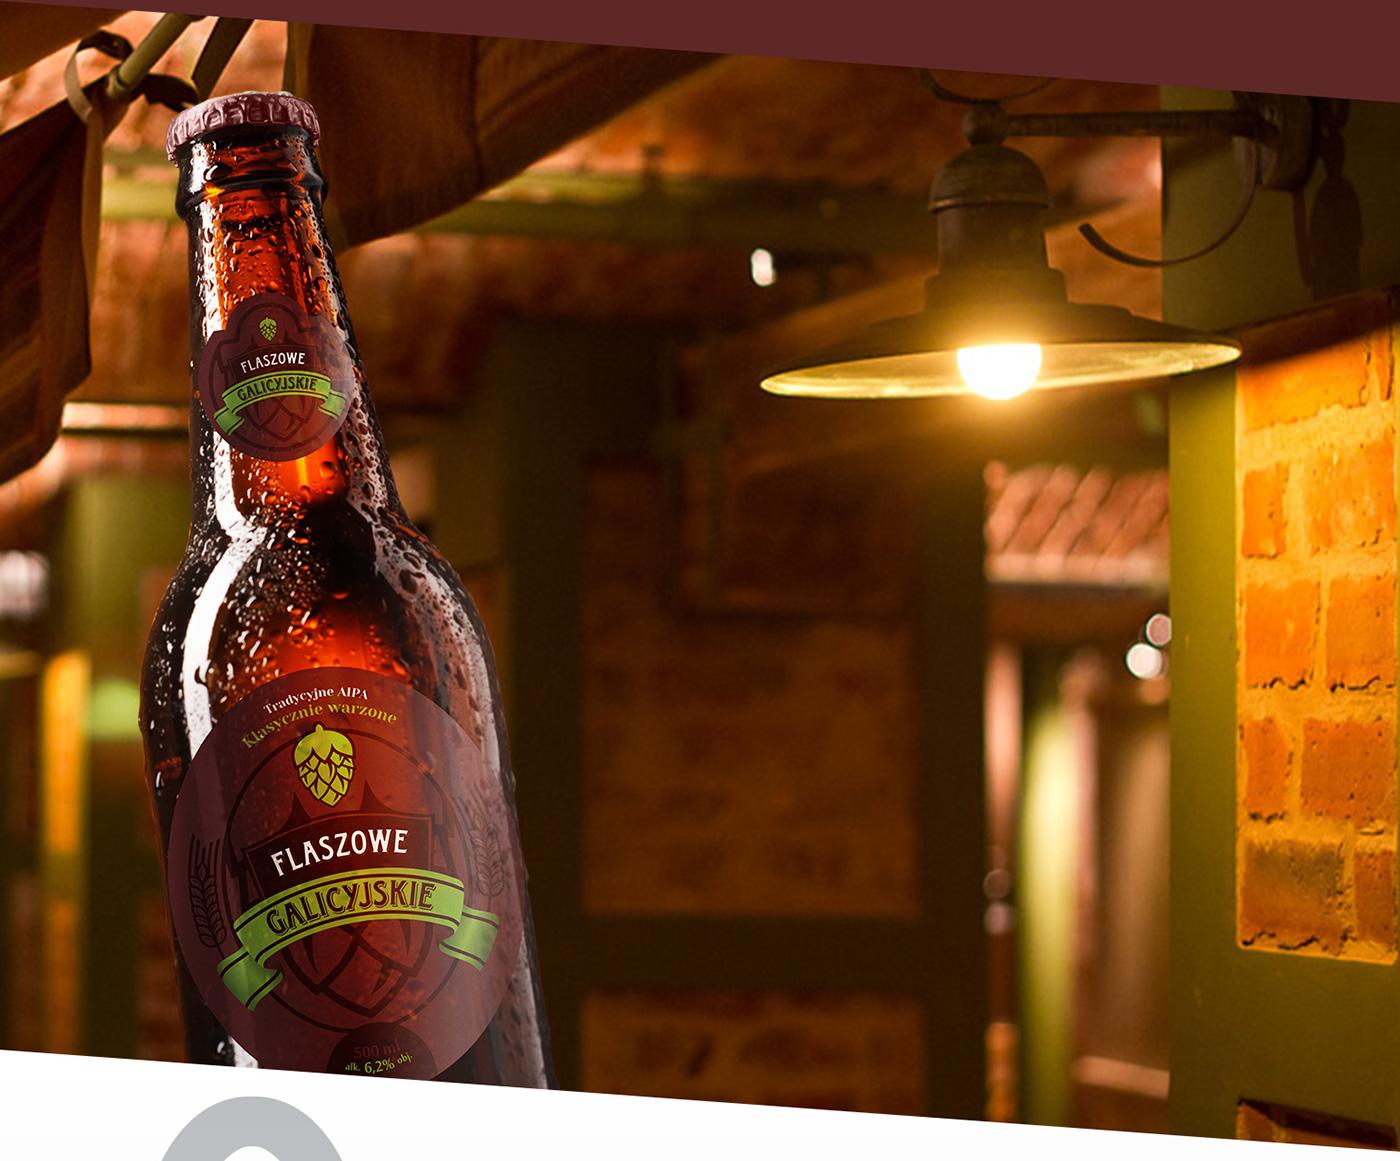 flaszowe galicyjskie flaszowe galicyjskie beer Beer Branding traditional beer Traditional Galician Galician Beer piwo galicyjskie piwo manufaktura Galicja manufaktura Beer Packaging etykiety